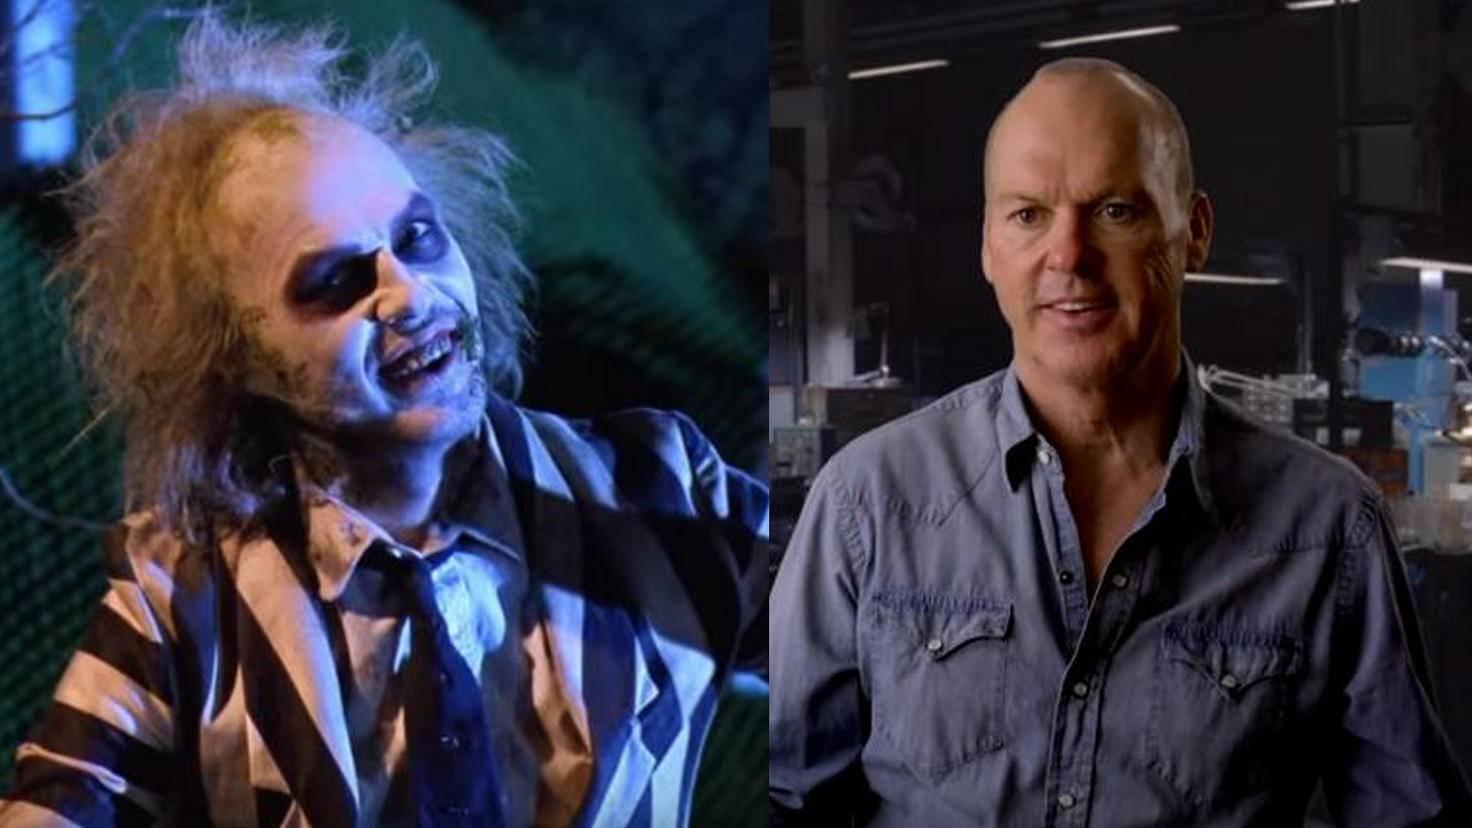 Beetlejuice-Michael Keaton-YouTube-Movieclips-Spider-Man Homecoming-Michael Keaton-YouTube-FilmIsNow Movie Bloopers und Extras